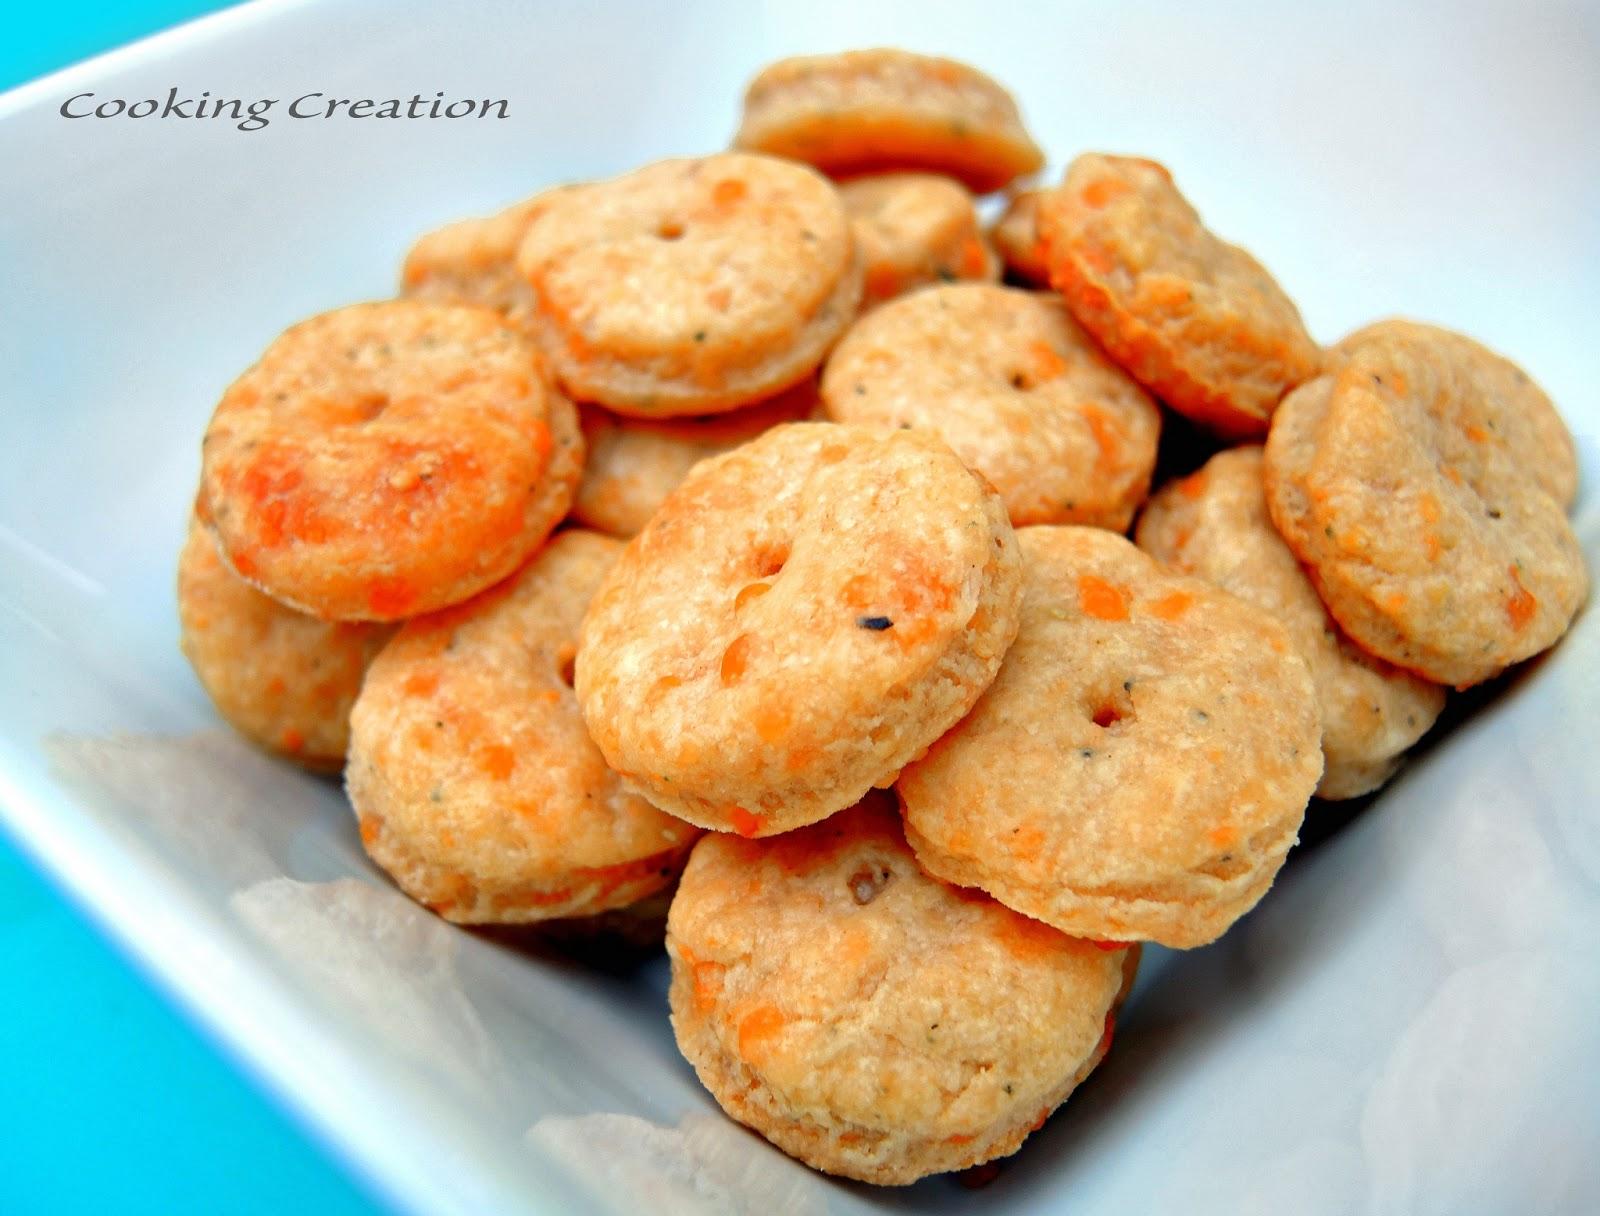 Cooking Creation: Baked Cheddar, Parmesan & Sage Crackers